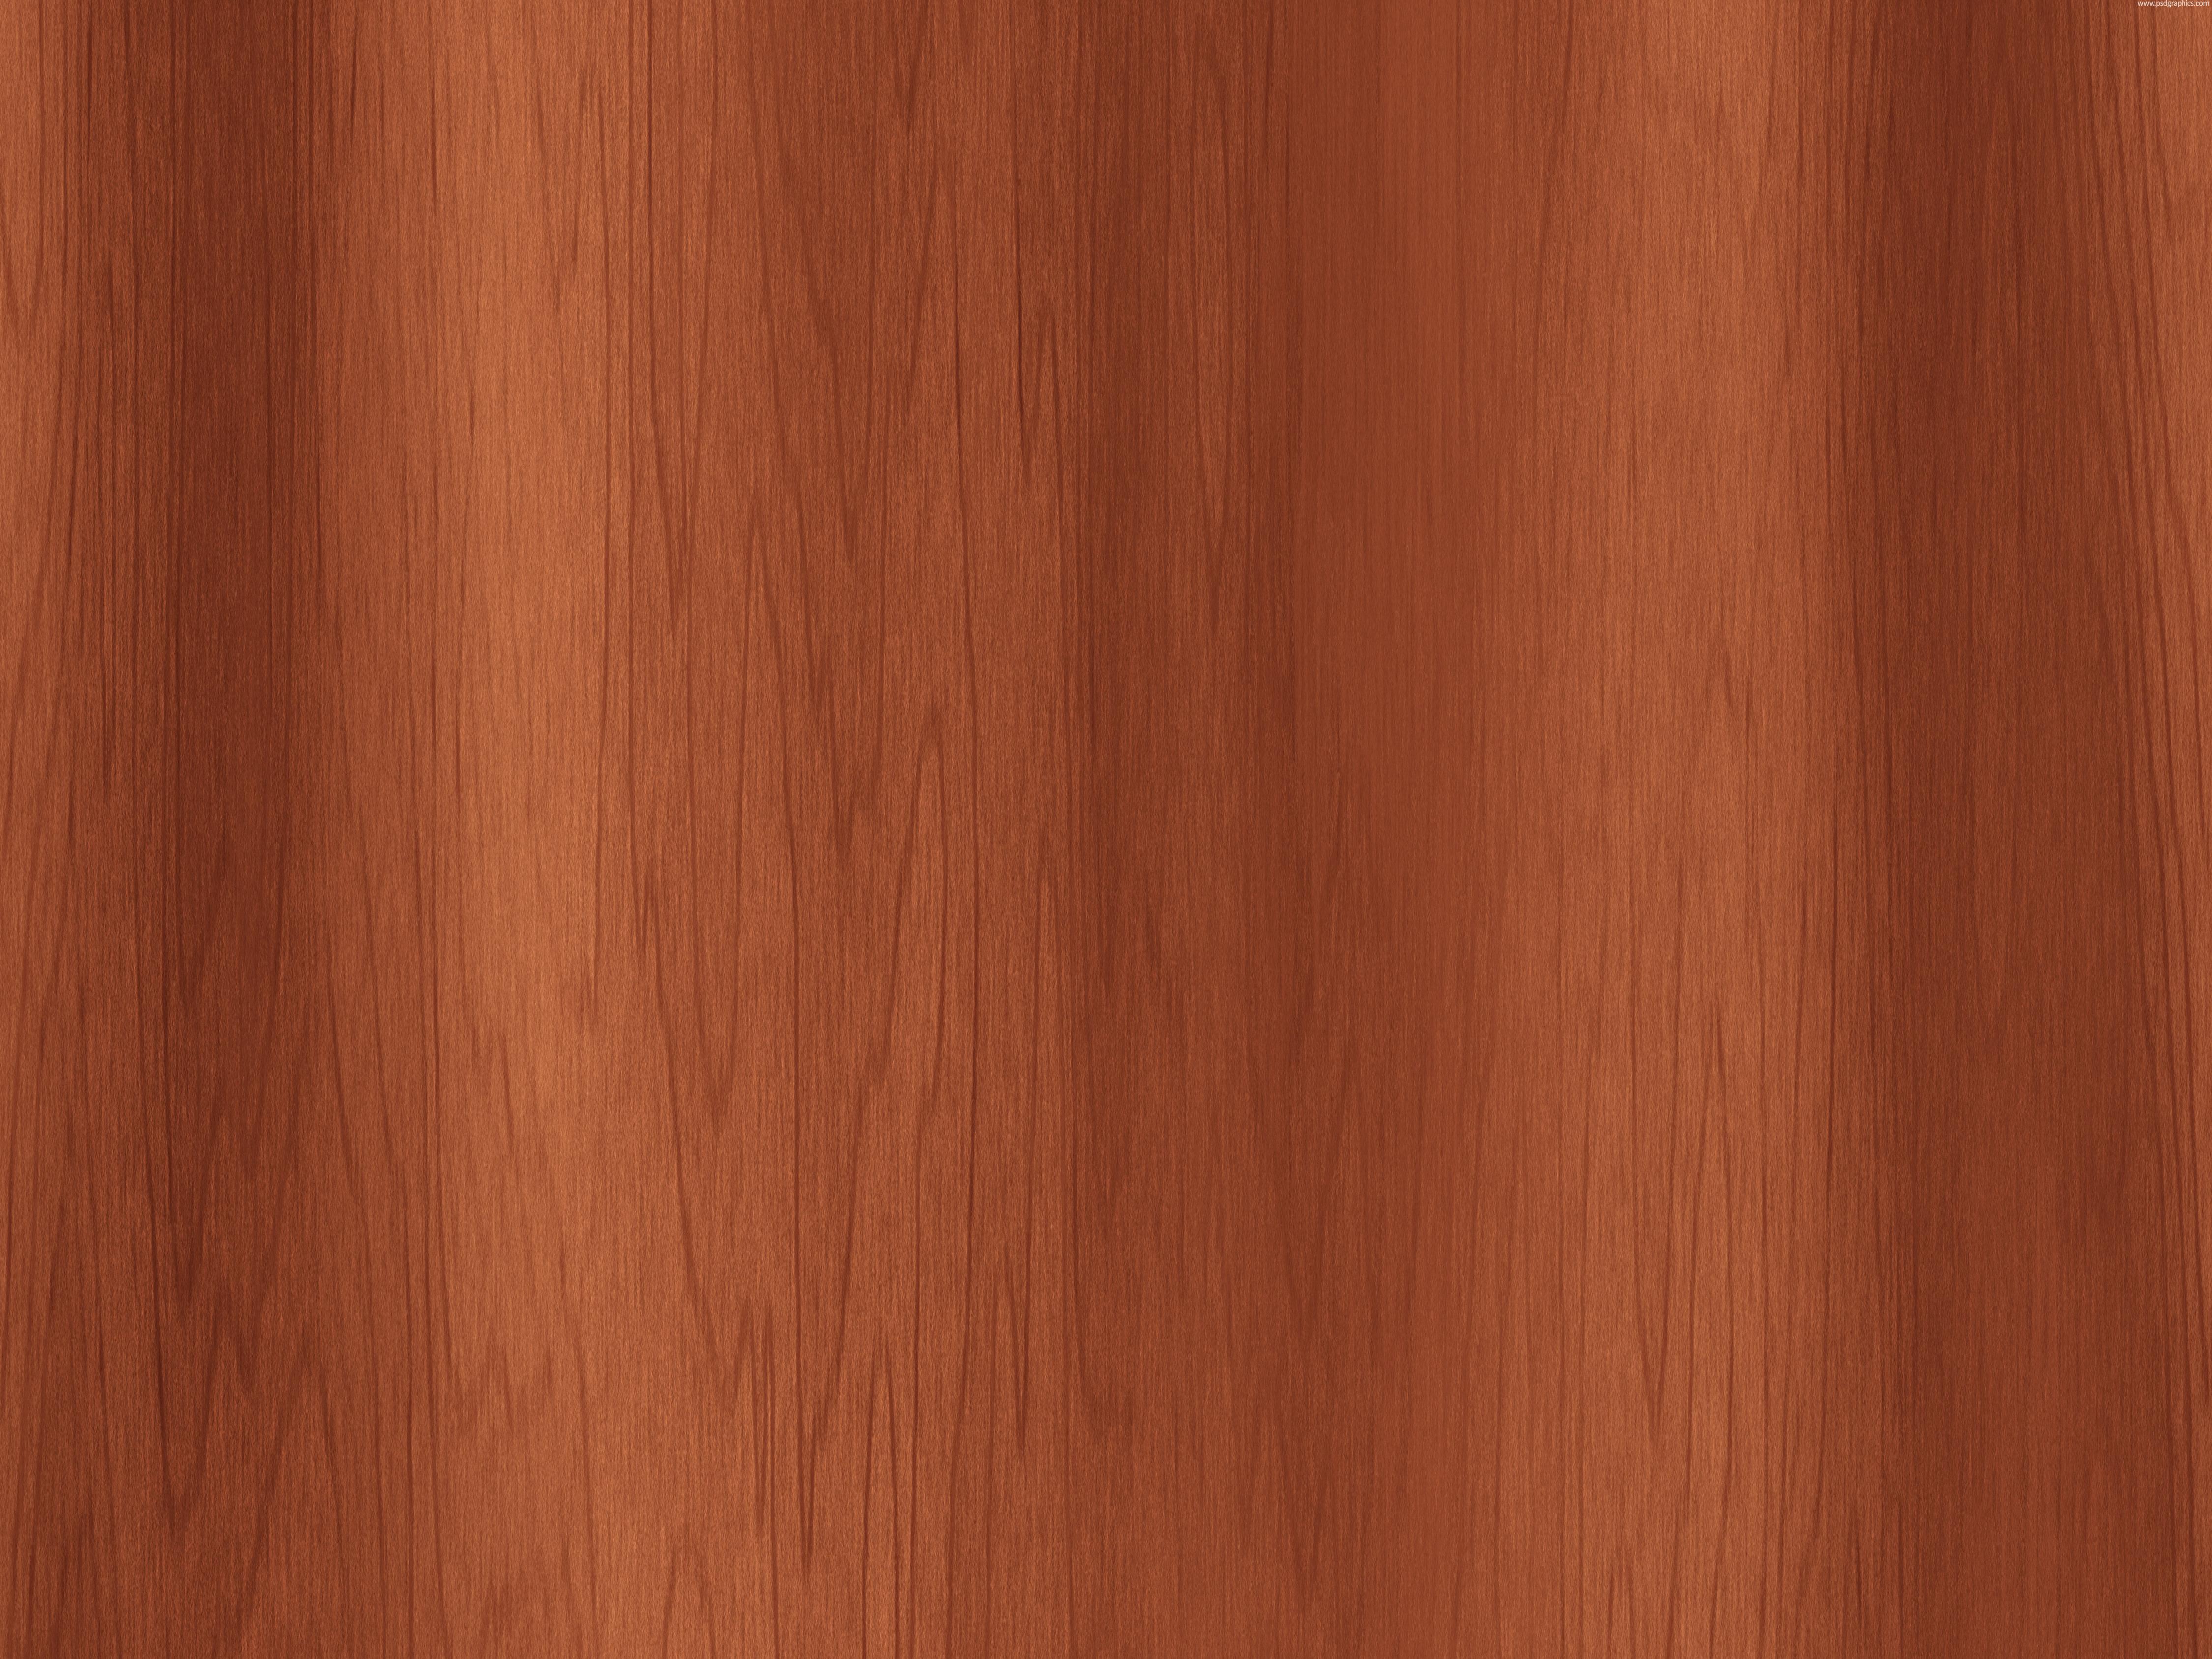 Wood Paneling Background Best 25 Wood Texture Background Ideas